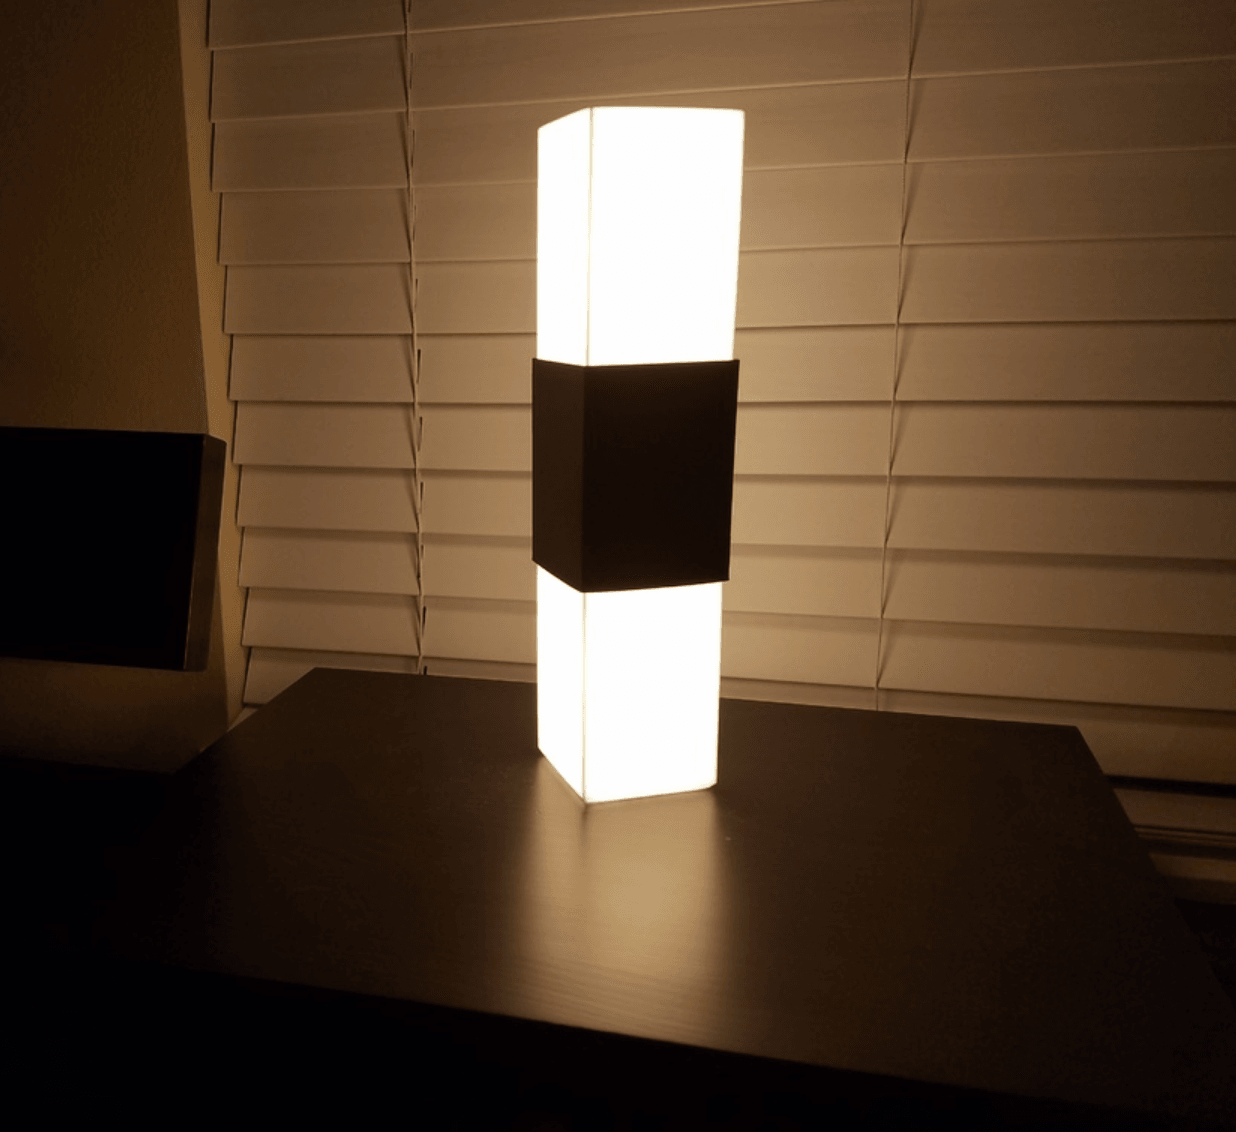 Capture d'écran 2018-03-26 à 16.59.50.png Download free STL file Square Lamp • 3D printer template, stensethjeremy